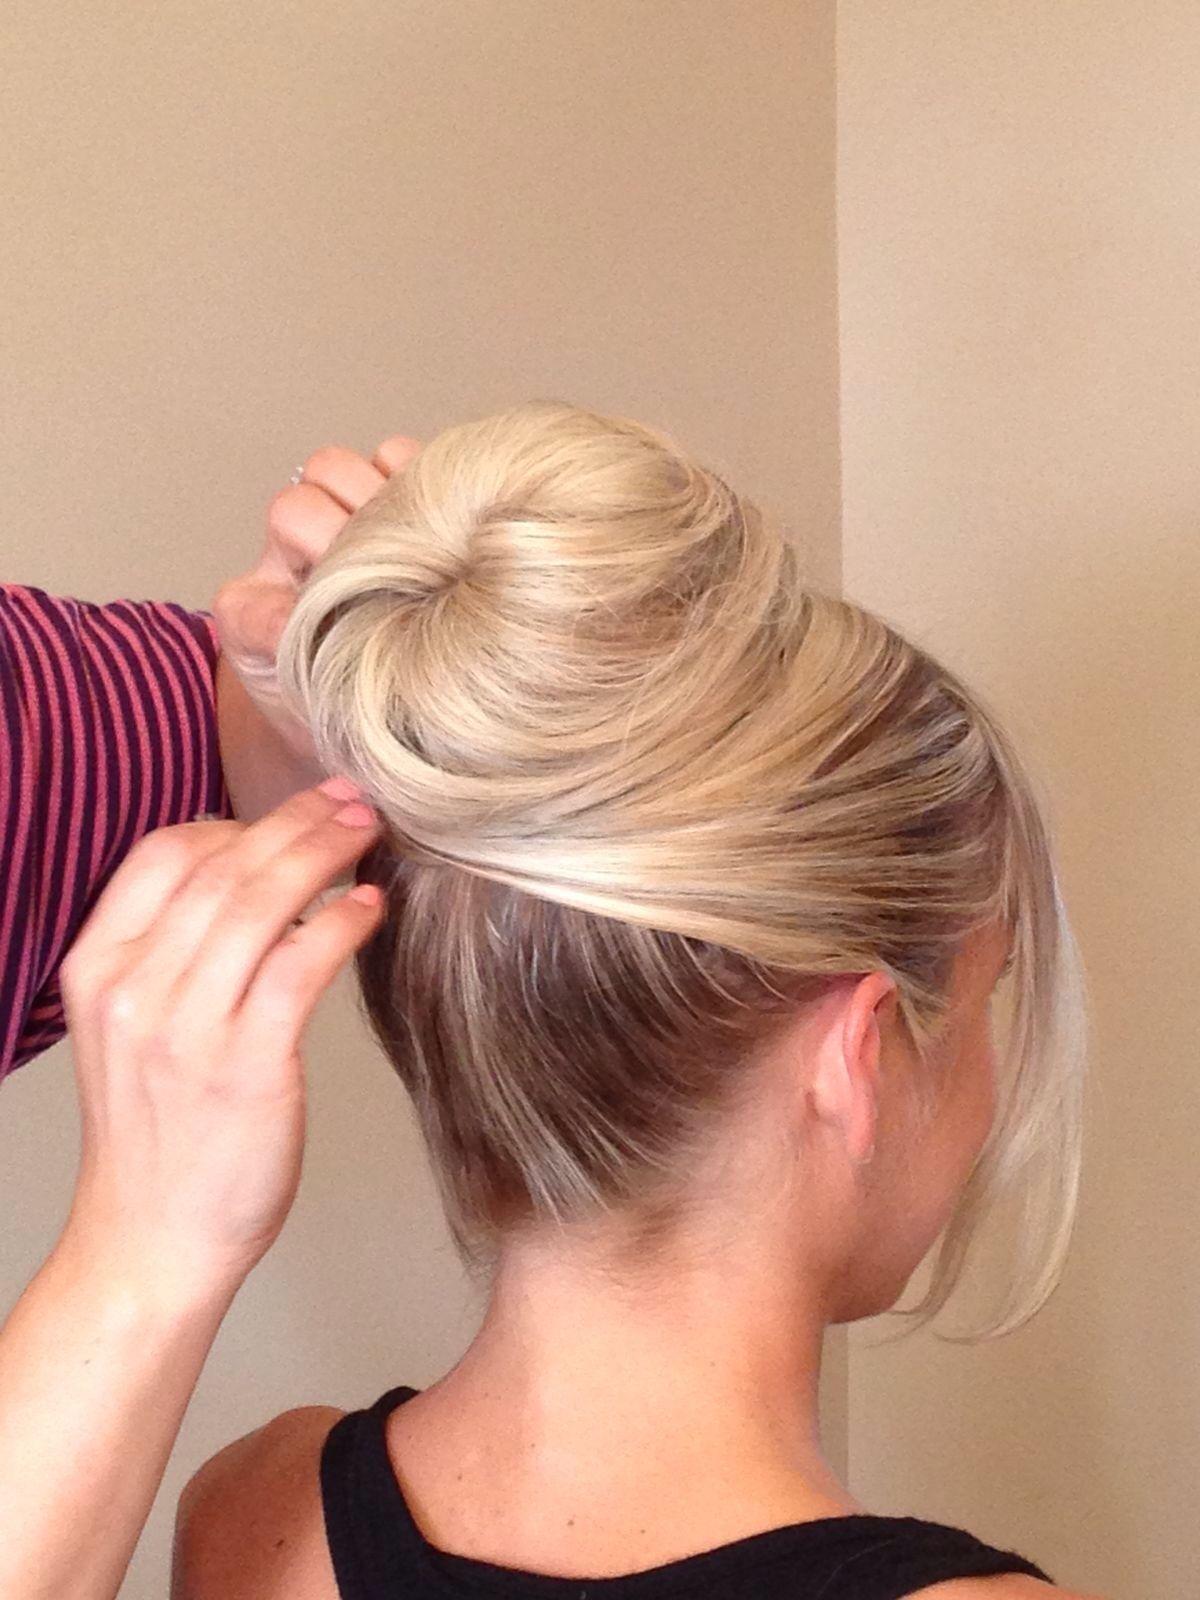 Luxury Hair And Makeup By Steph Fall Hair Trend 3 High Bun